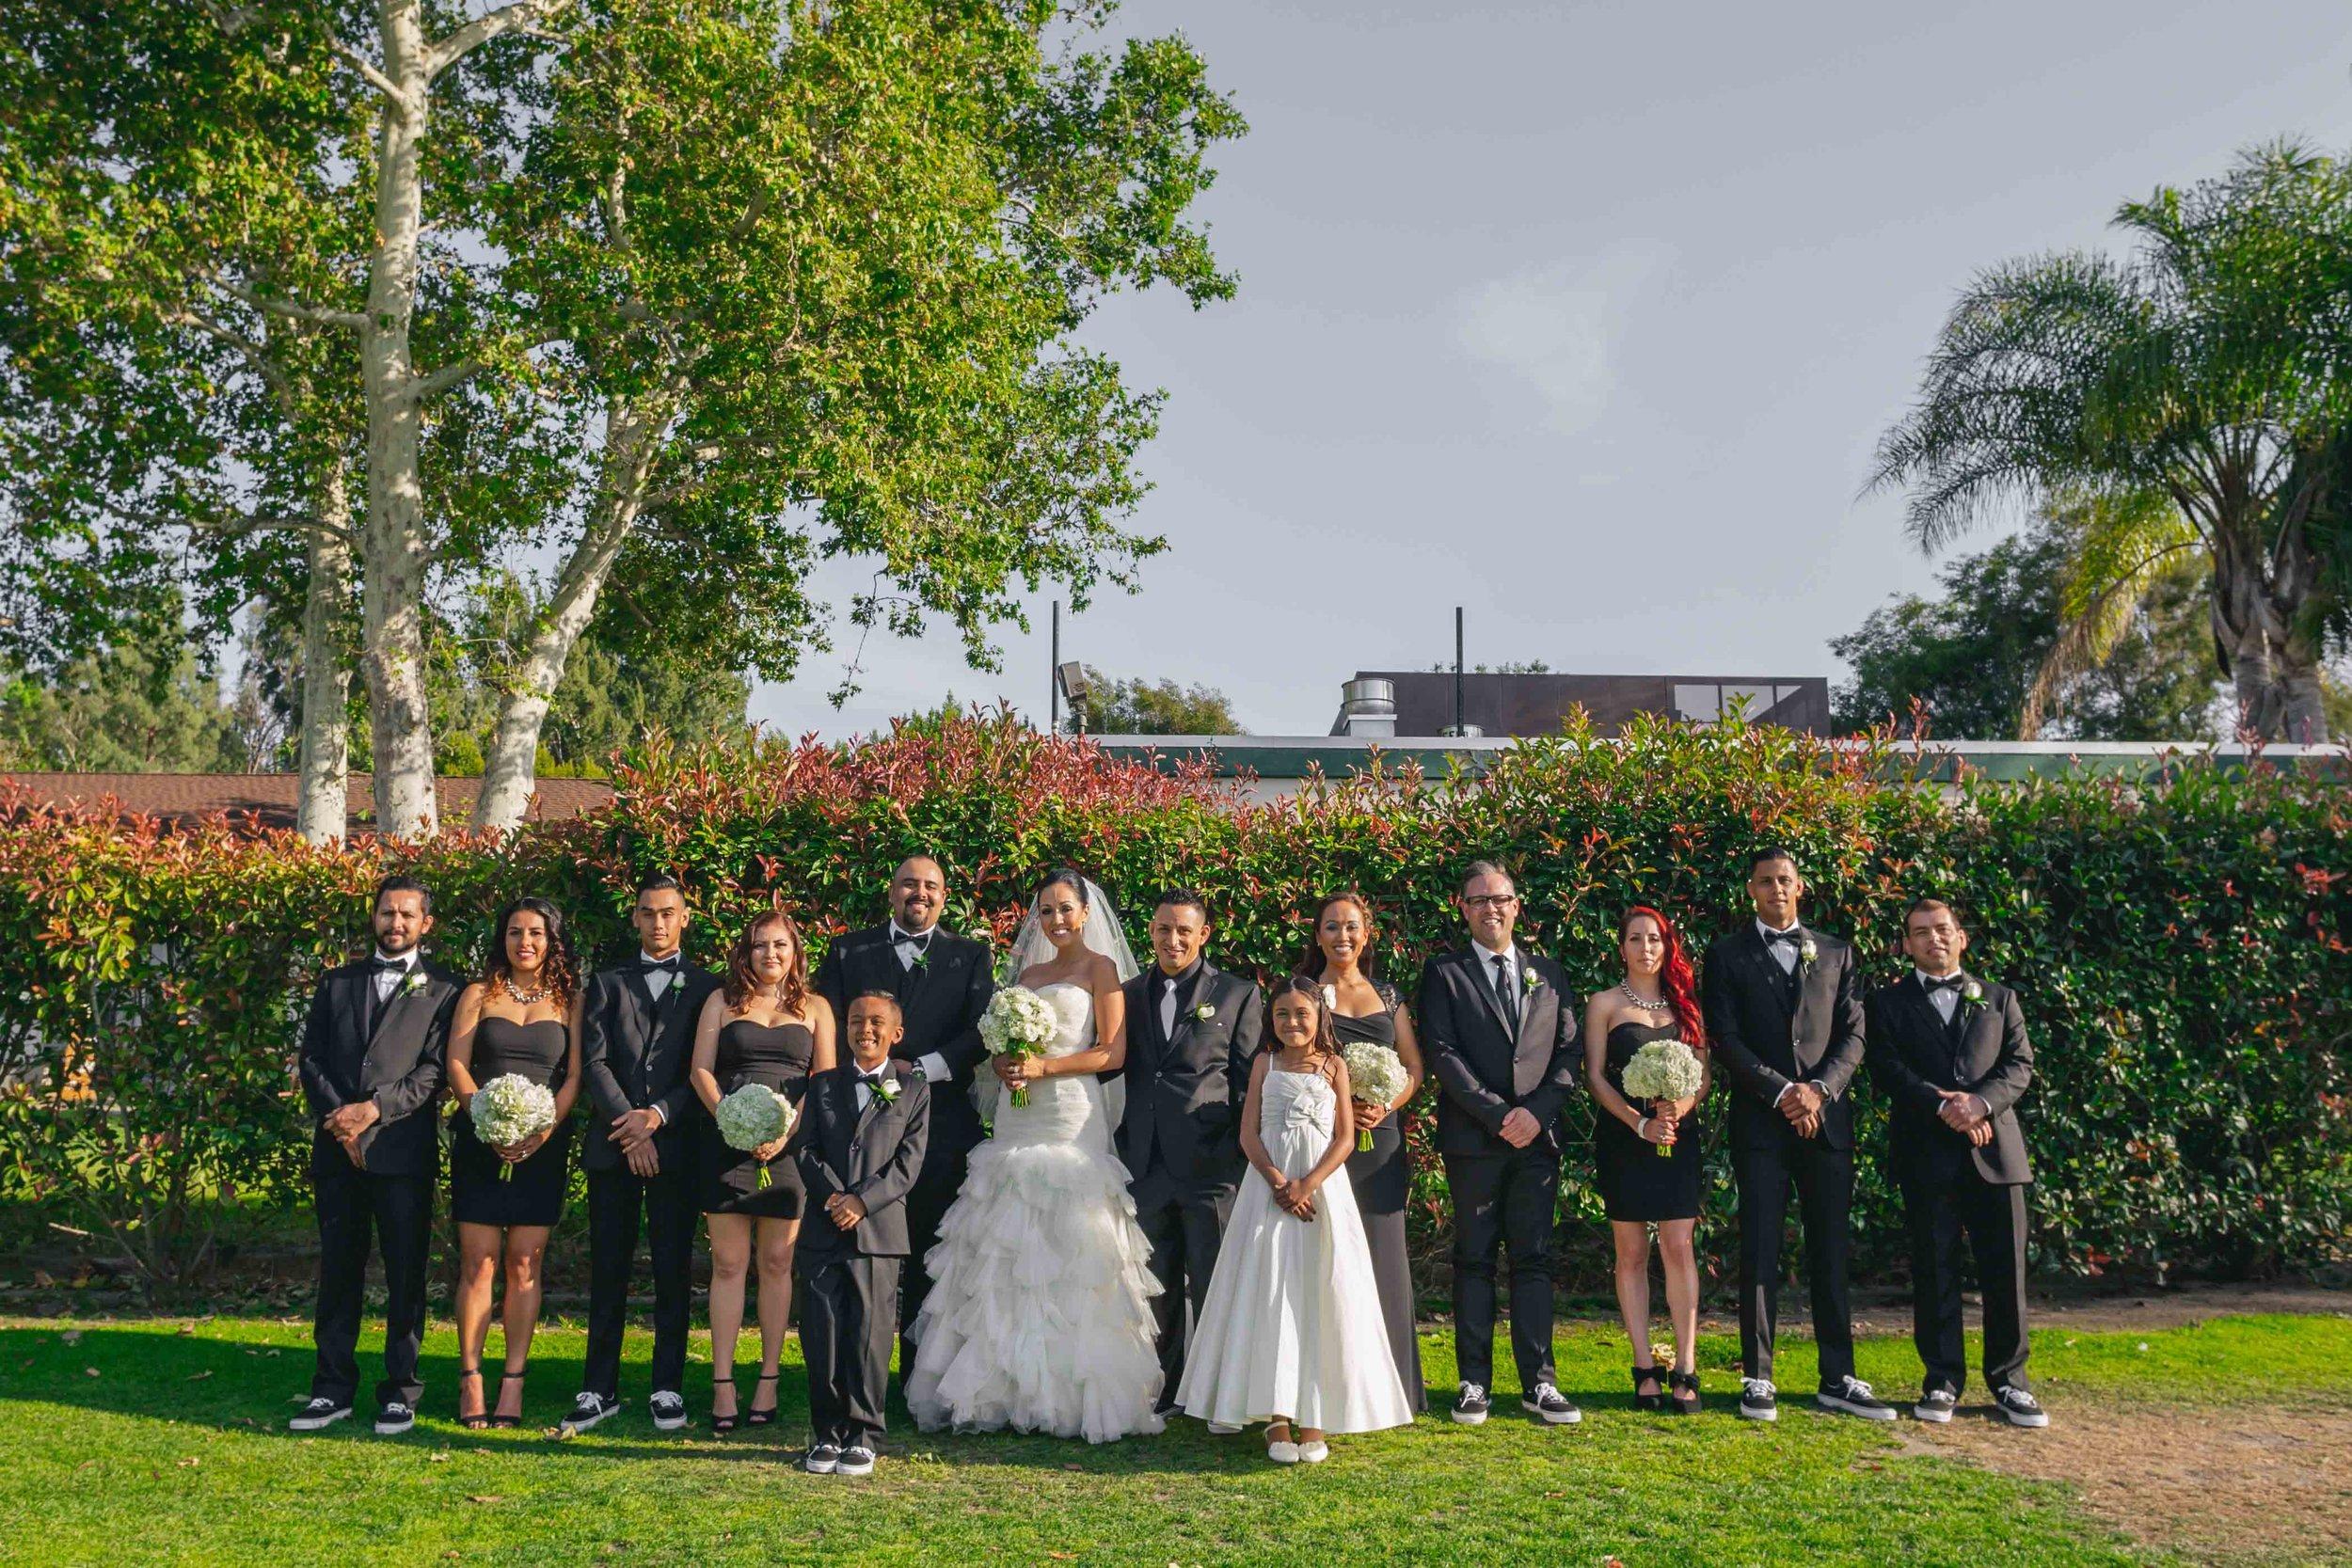 APavone-Photographer-Orange-County-Diamond-Bar-Wedding-062.jpg